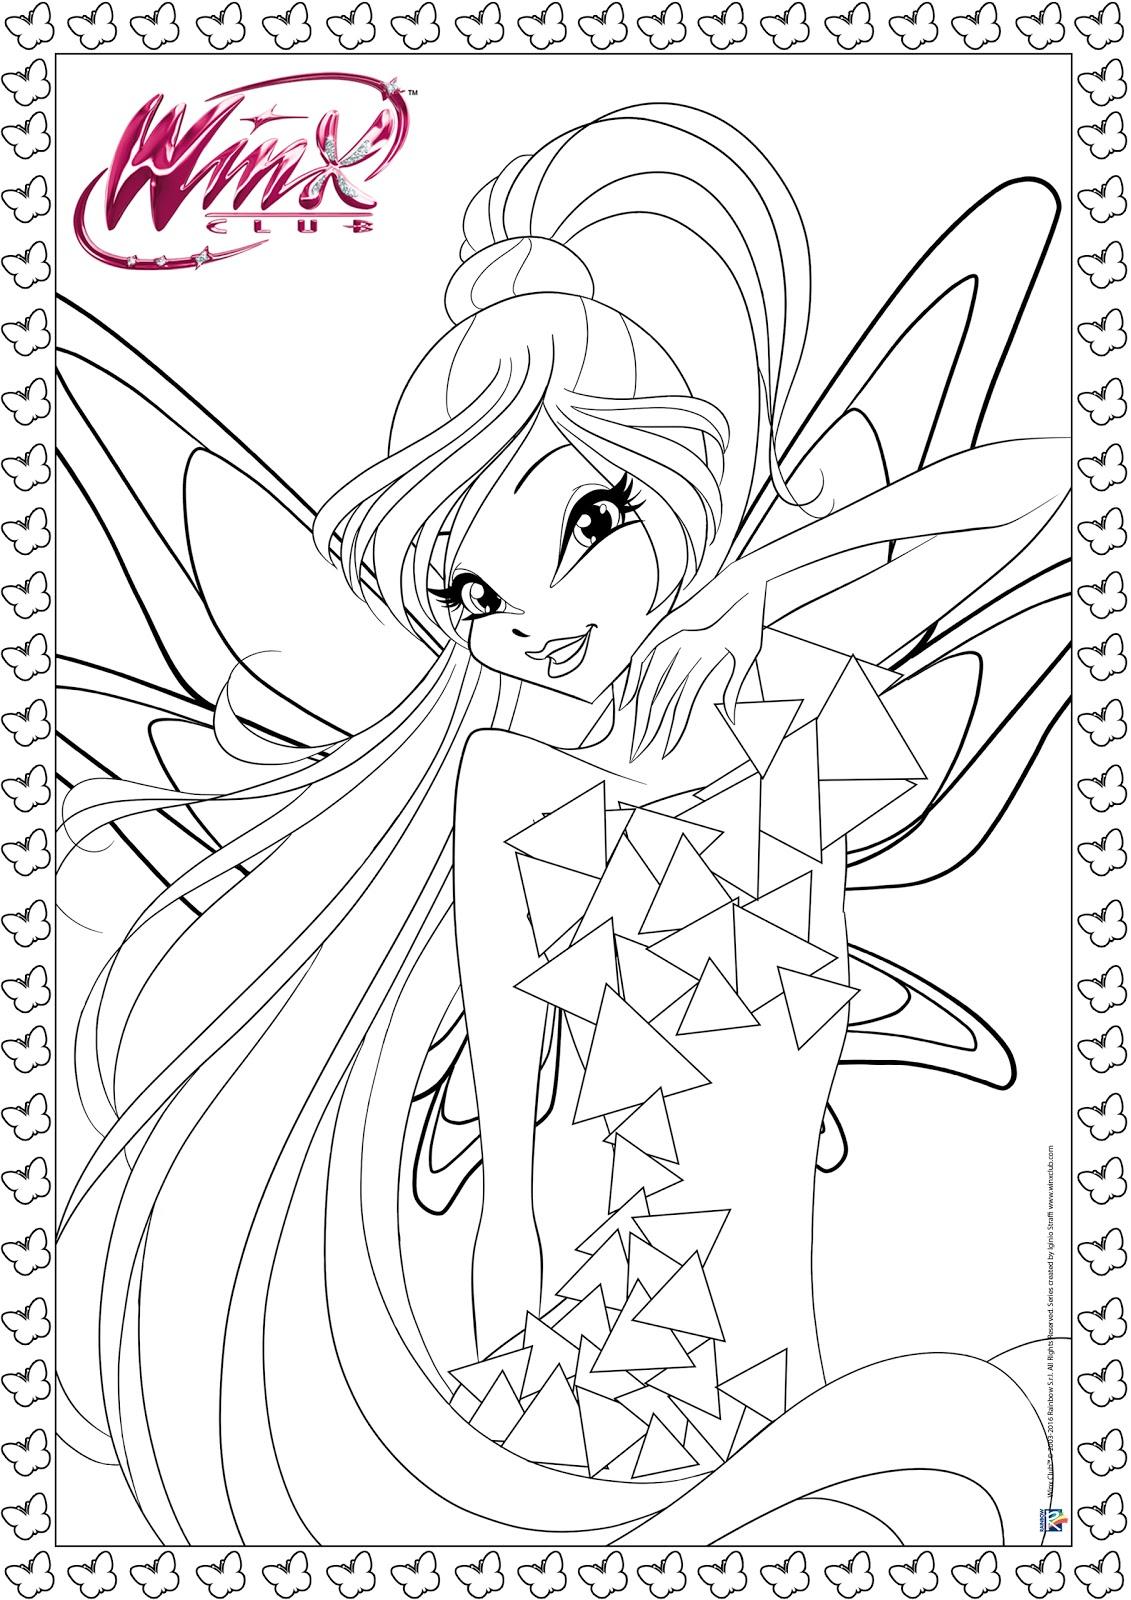 Imprime y Colorea al Winx Club Tynix ~ My Winx Club Pretty!*.